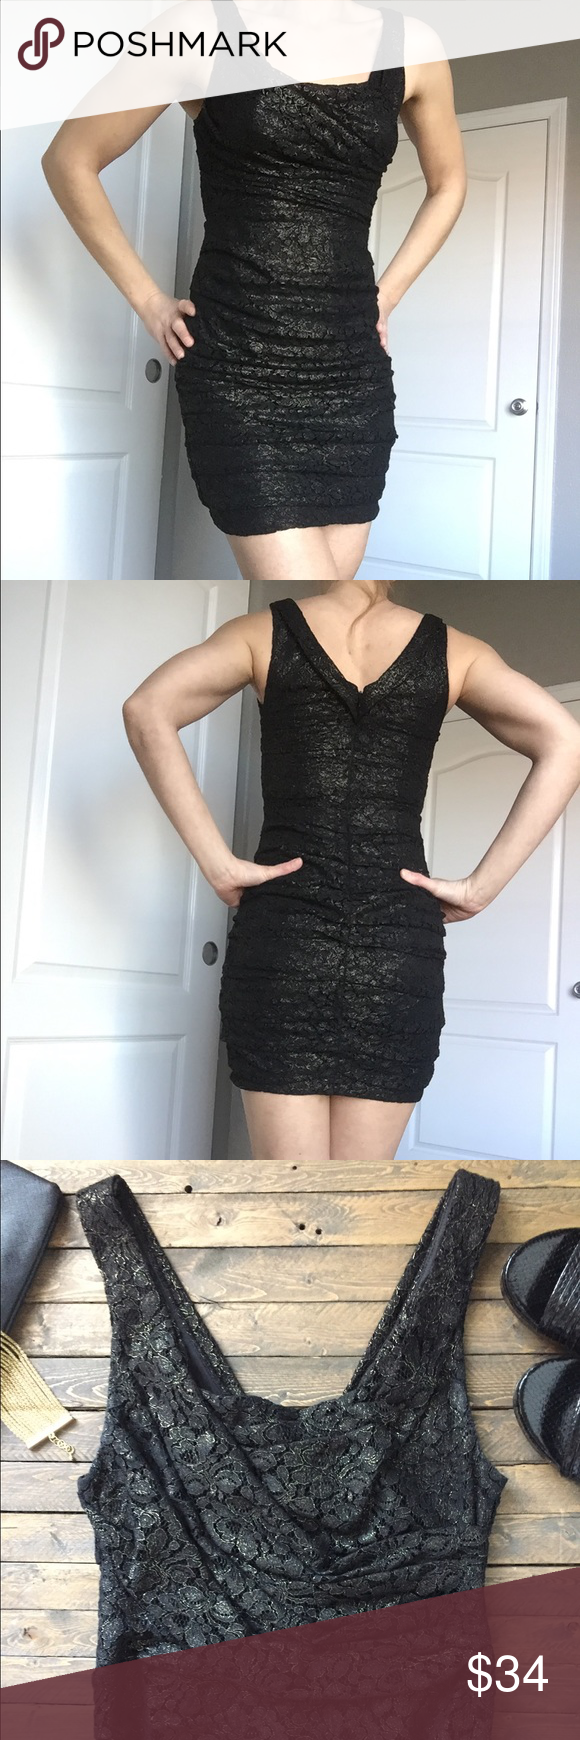 Express Black Lace Dress Gold Lace Dresses Form Fitting Dress Fashion [ 1740 x 580 Pixel ]